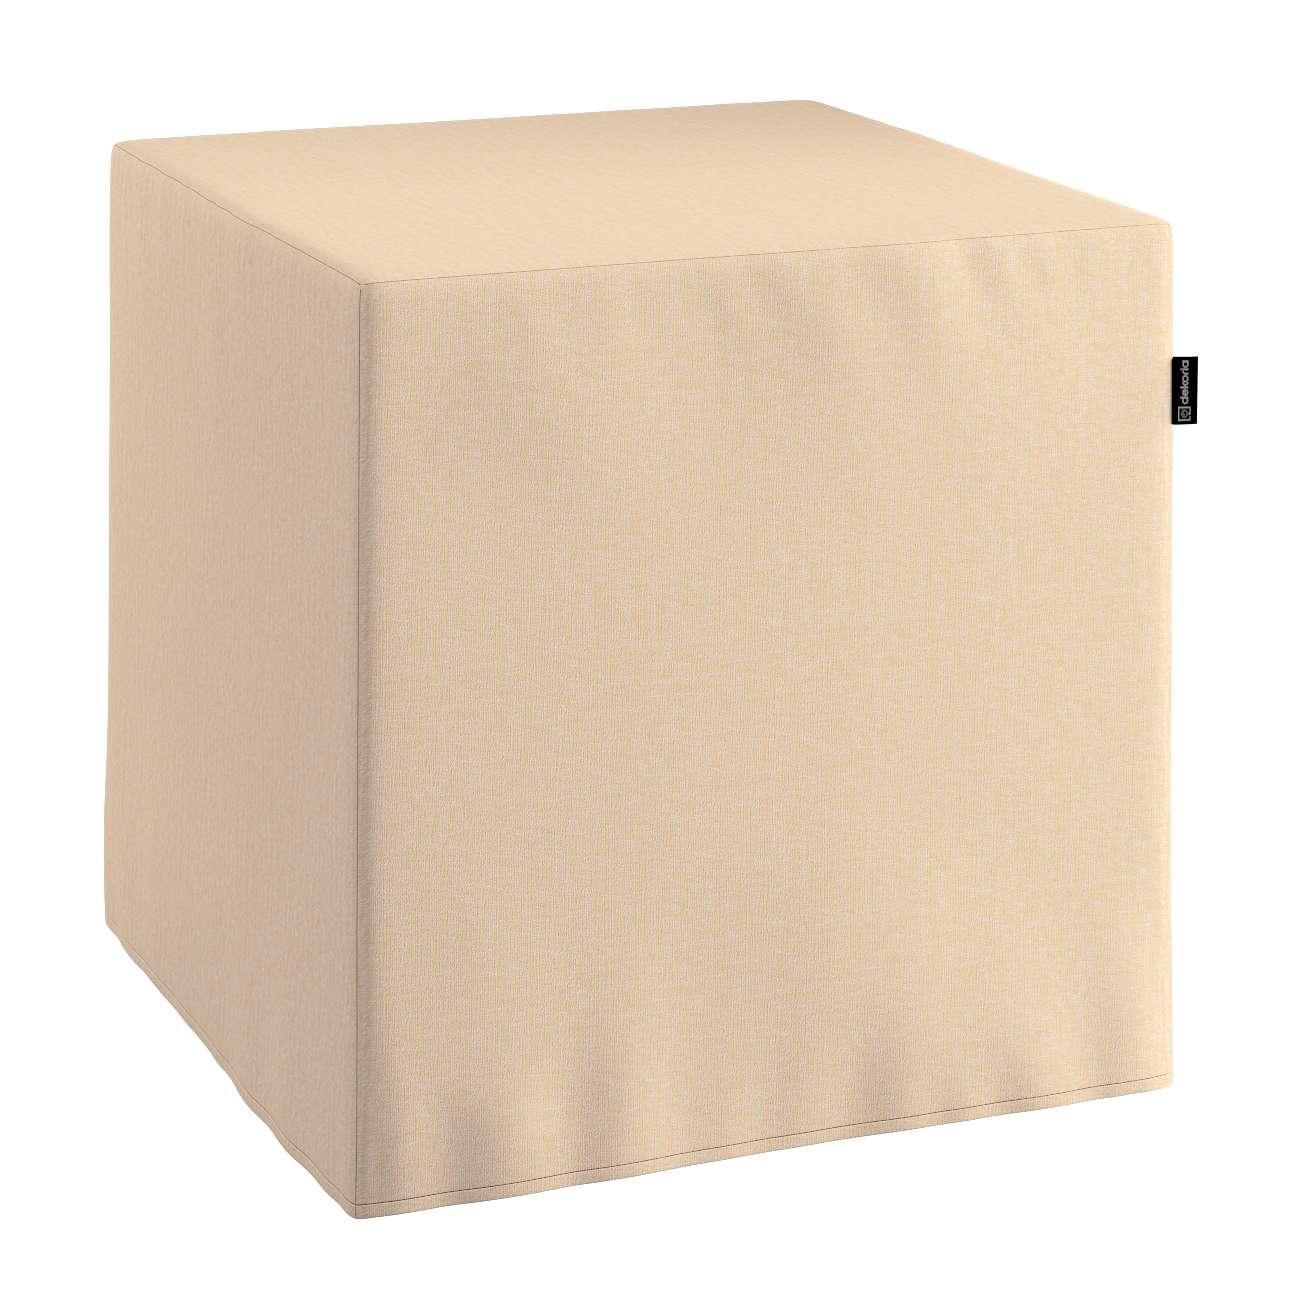 Sedák Cube - kostka pevná 40x40x40 v kolekci Chenille , látka: 702-22